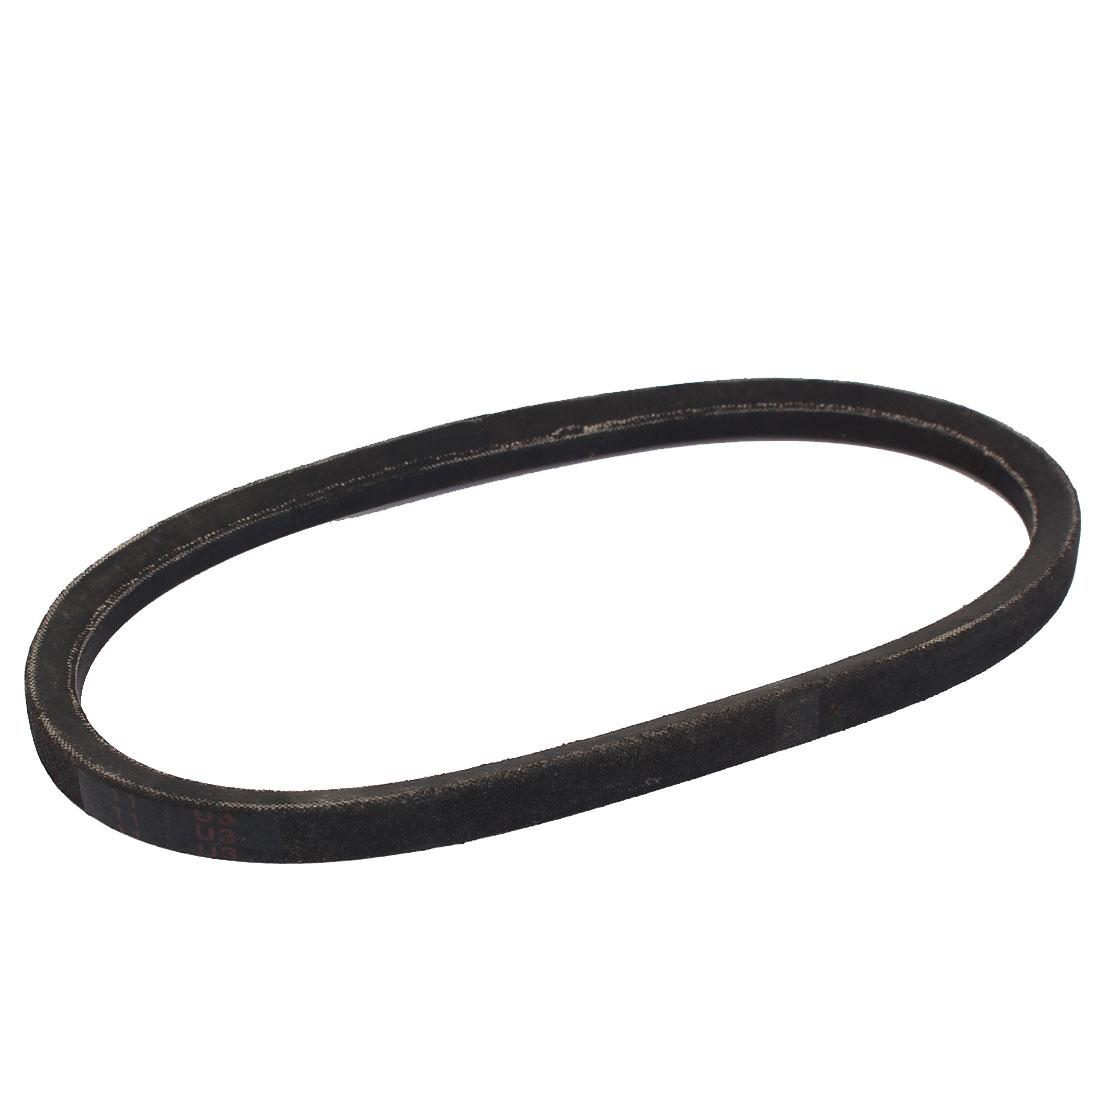 "A19 Type Rubber Machine Transmission Band Drive Vee V Belt 19"" x 1/2"" Black"